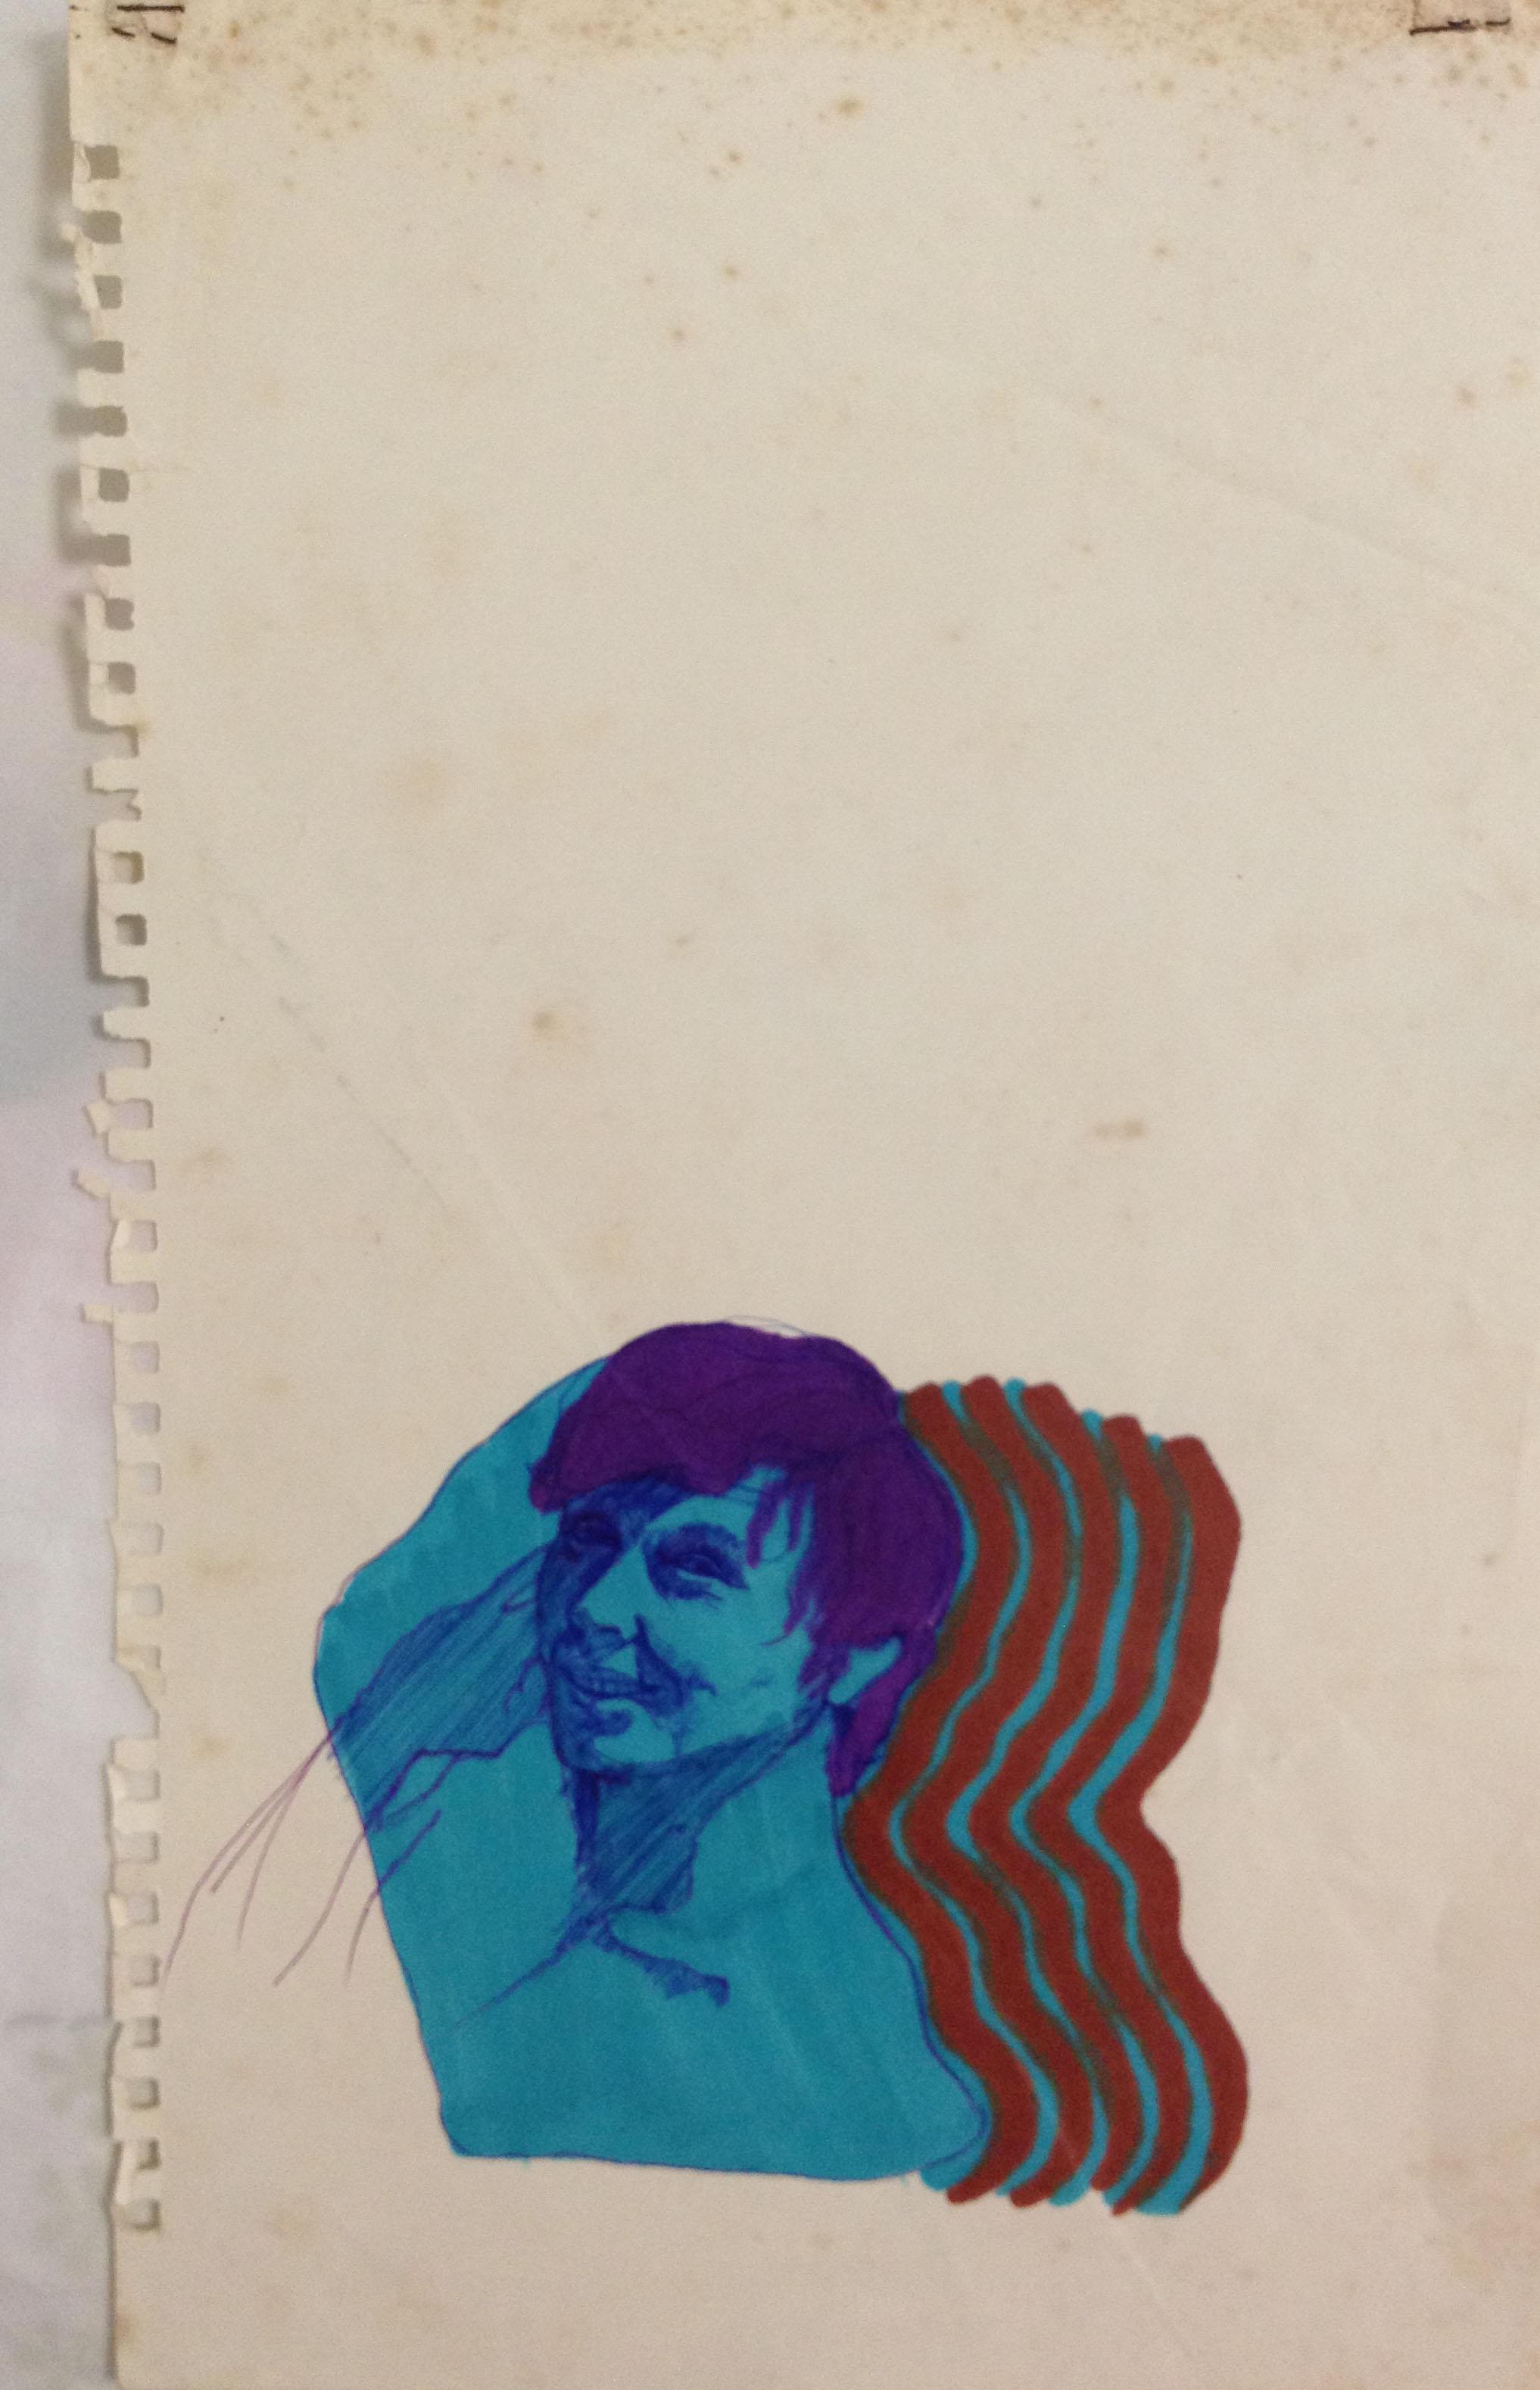 studying art history 3